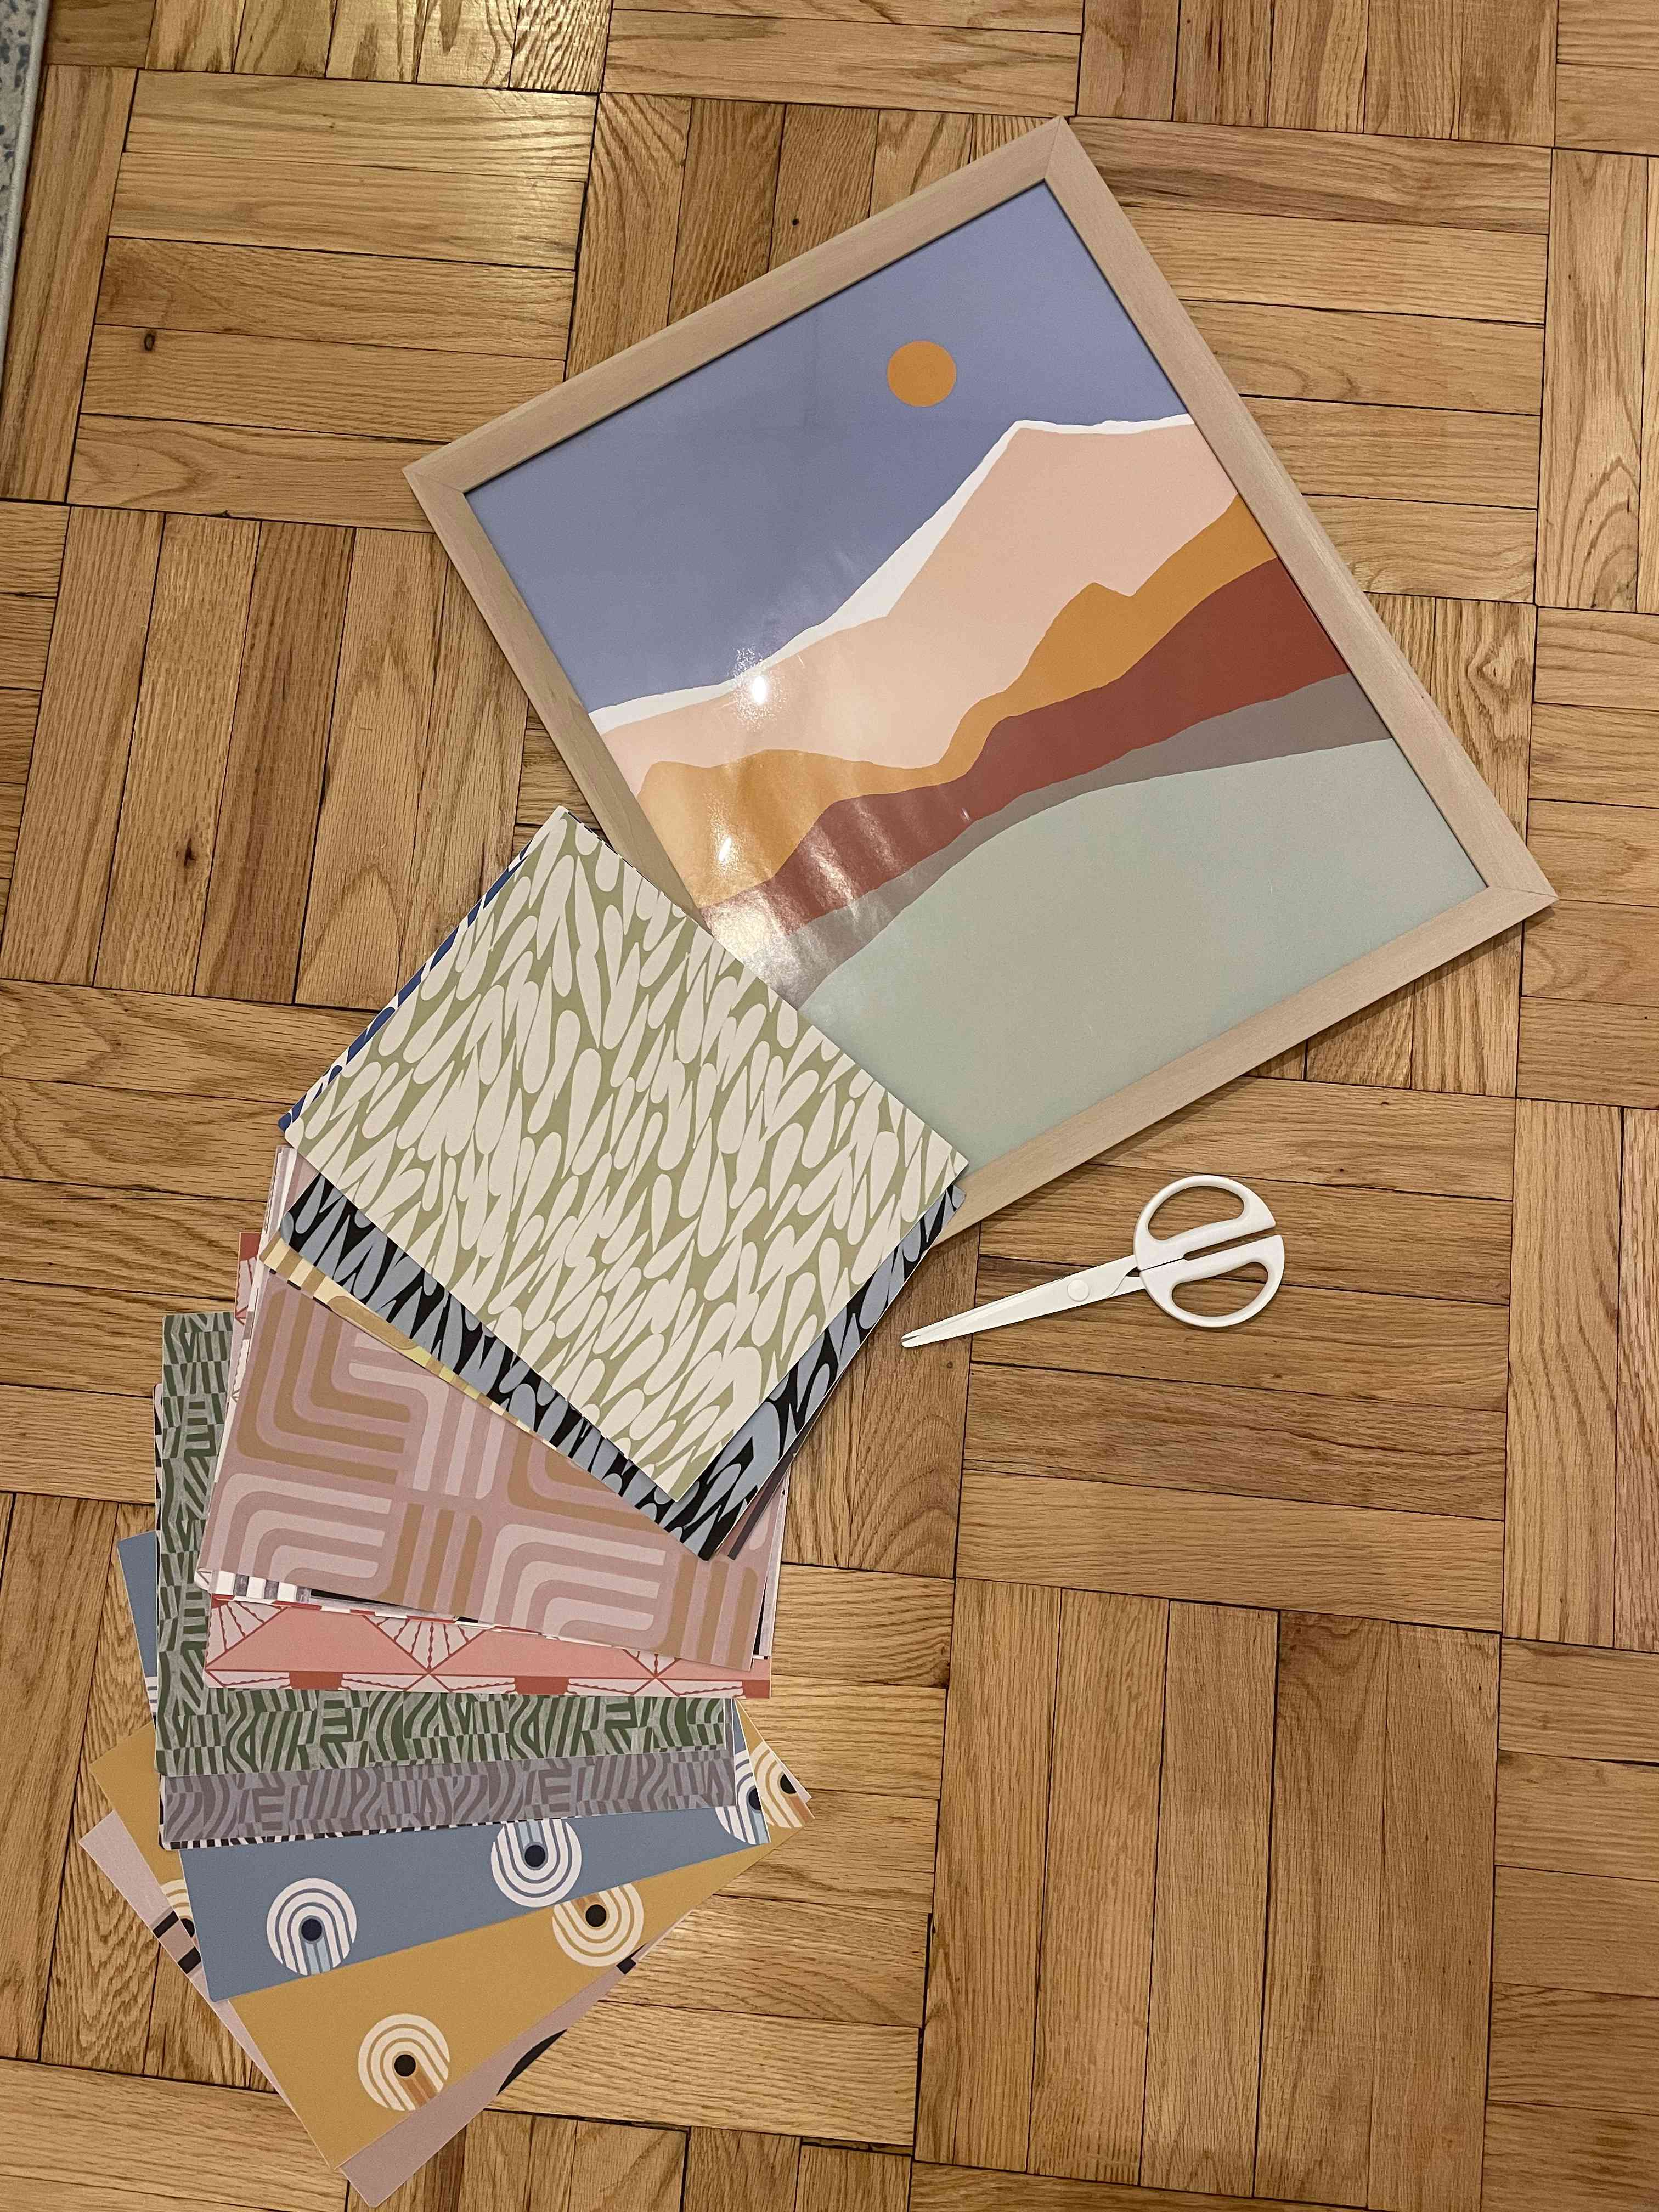 gather your supplies - wallpaper, scissors, empty frame